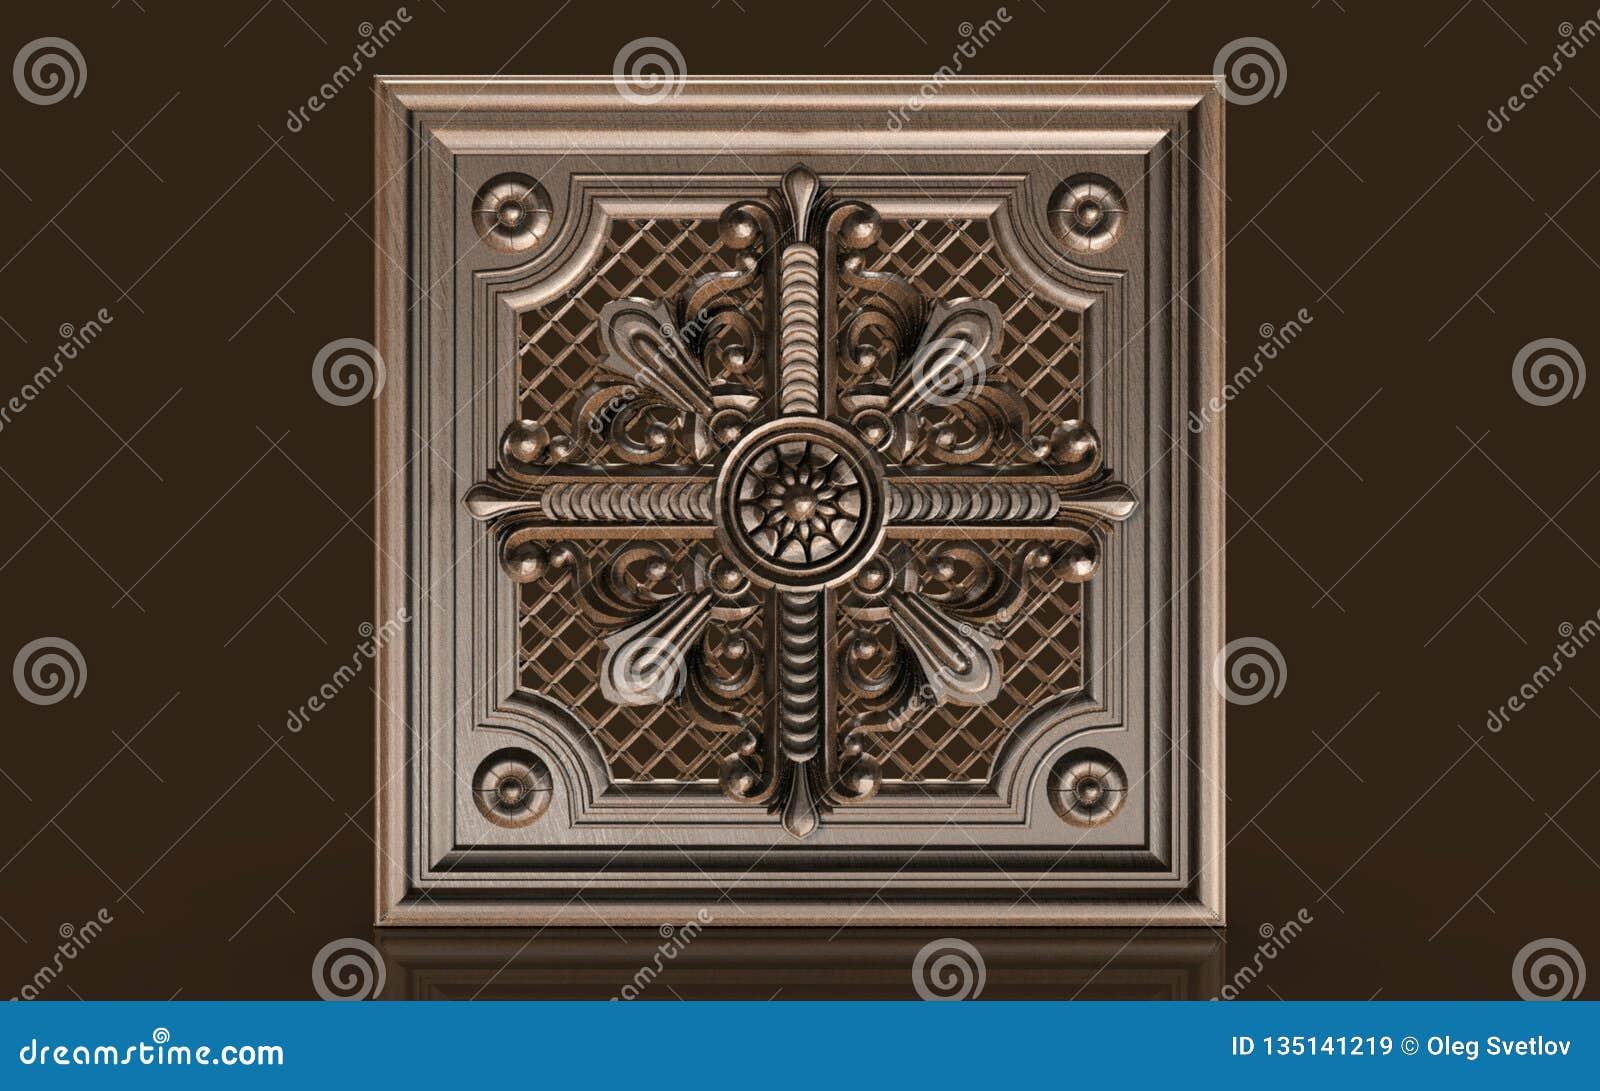 The pattern for the wording, logo, emblem,business,talisman,prediction,future,3d models,inspiration, decoration, work, ornament, r